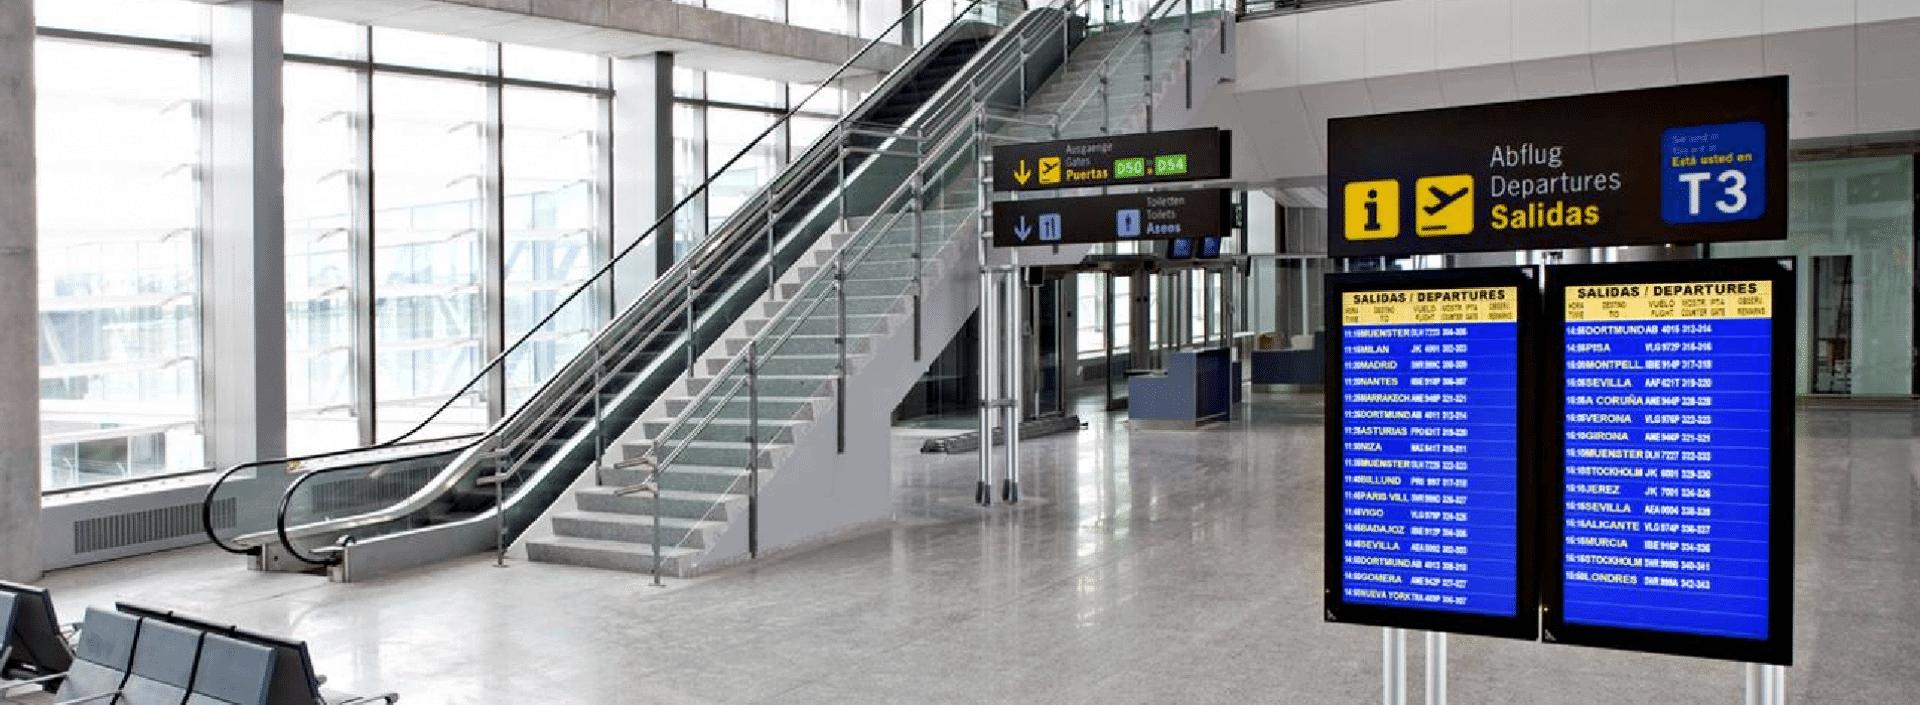 Málaga Airport - Fetajo Car hire